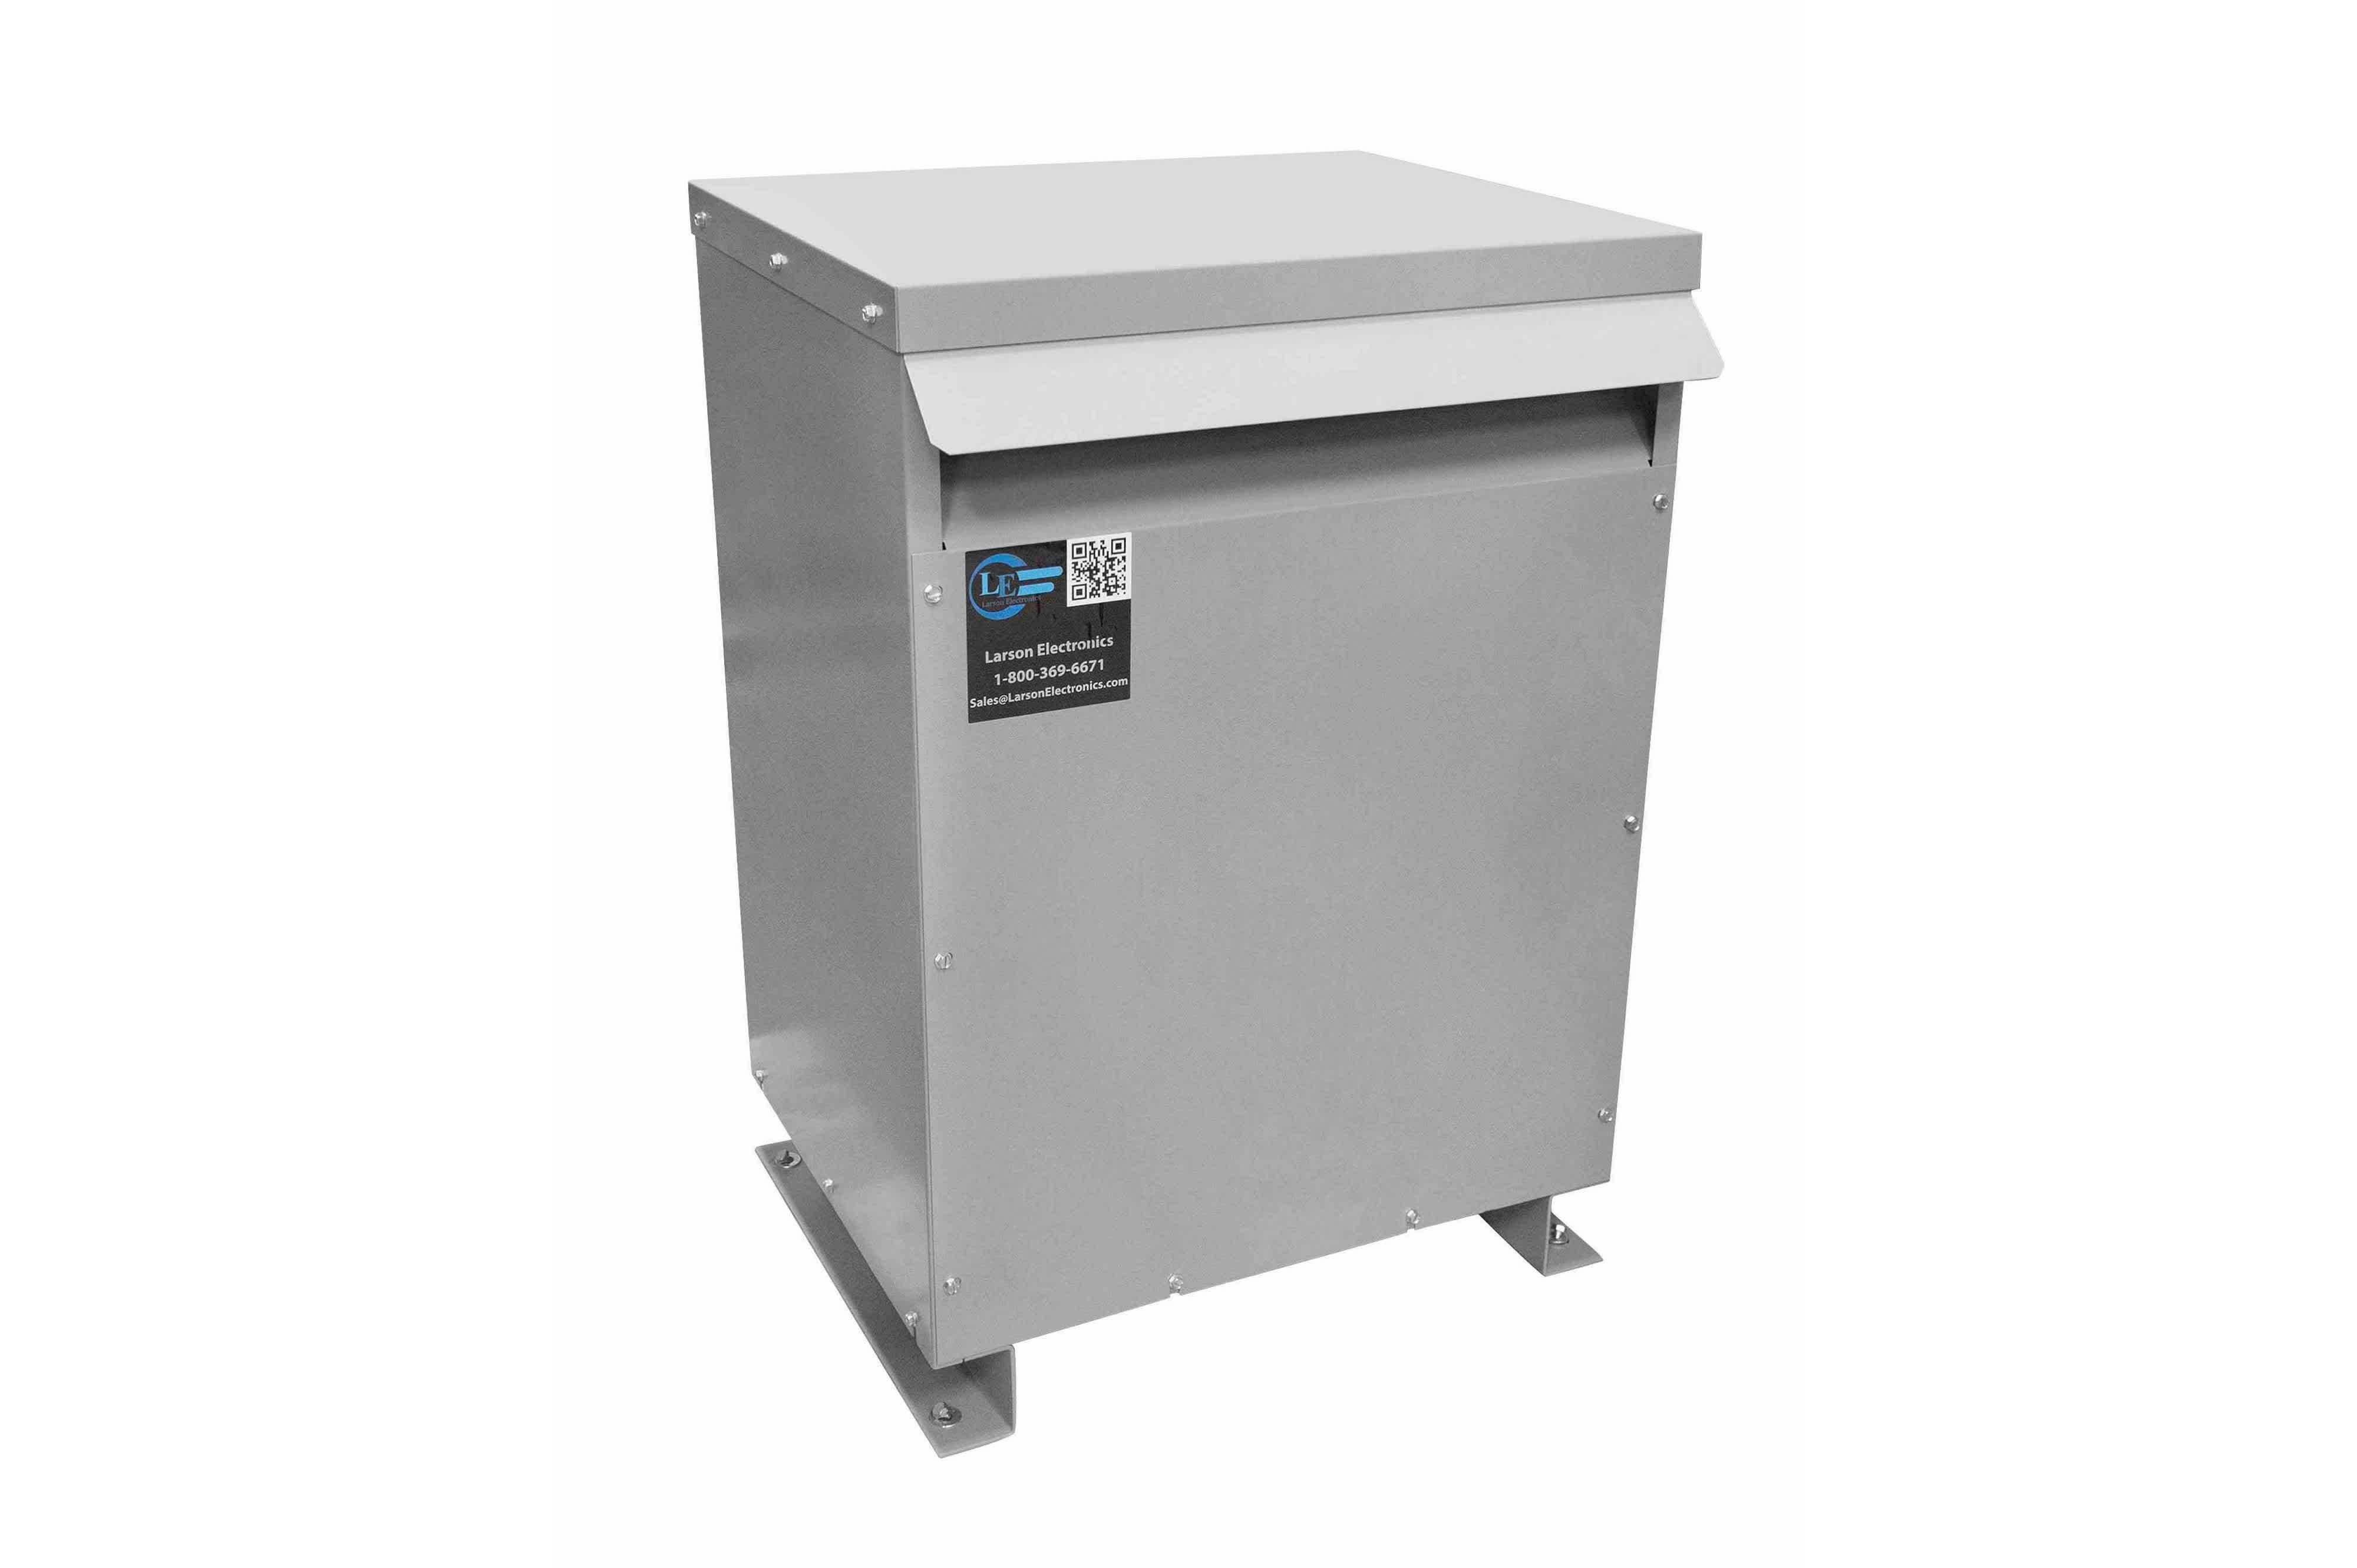 12 kVA 3PH Isolation Transformer, 400V Wye Primary, 208Y/120 Wye-N Secondary, N3R, Ventilated, 60 Hz